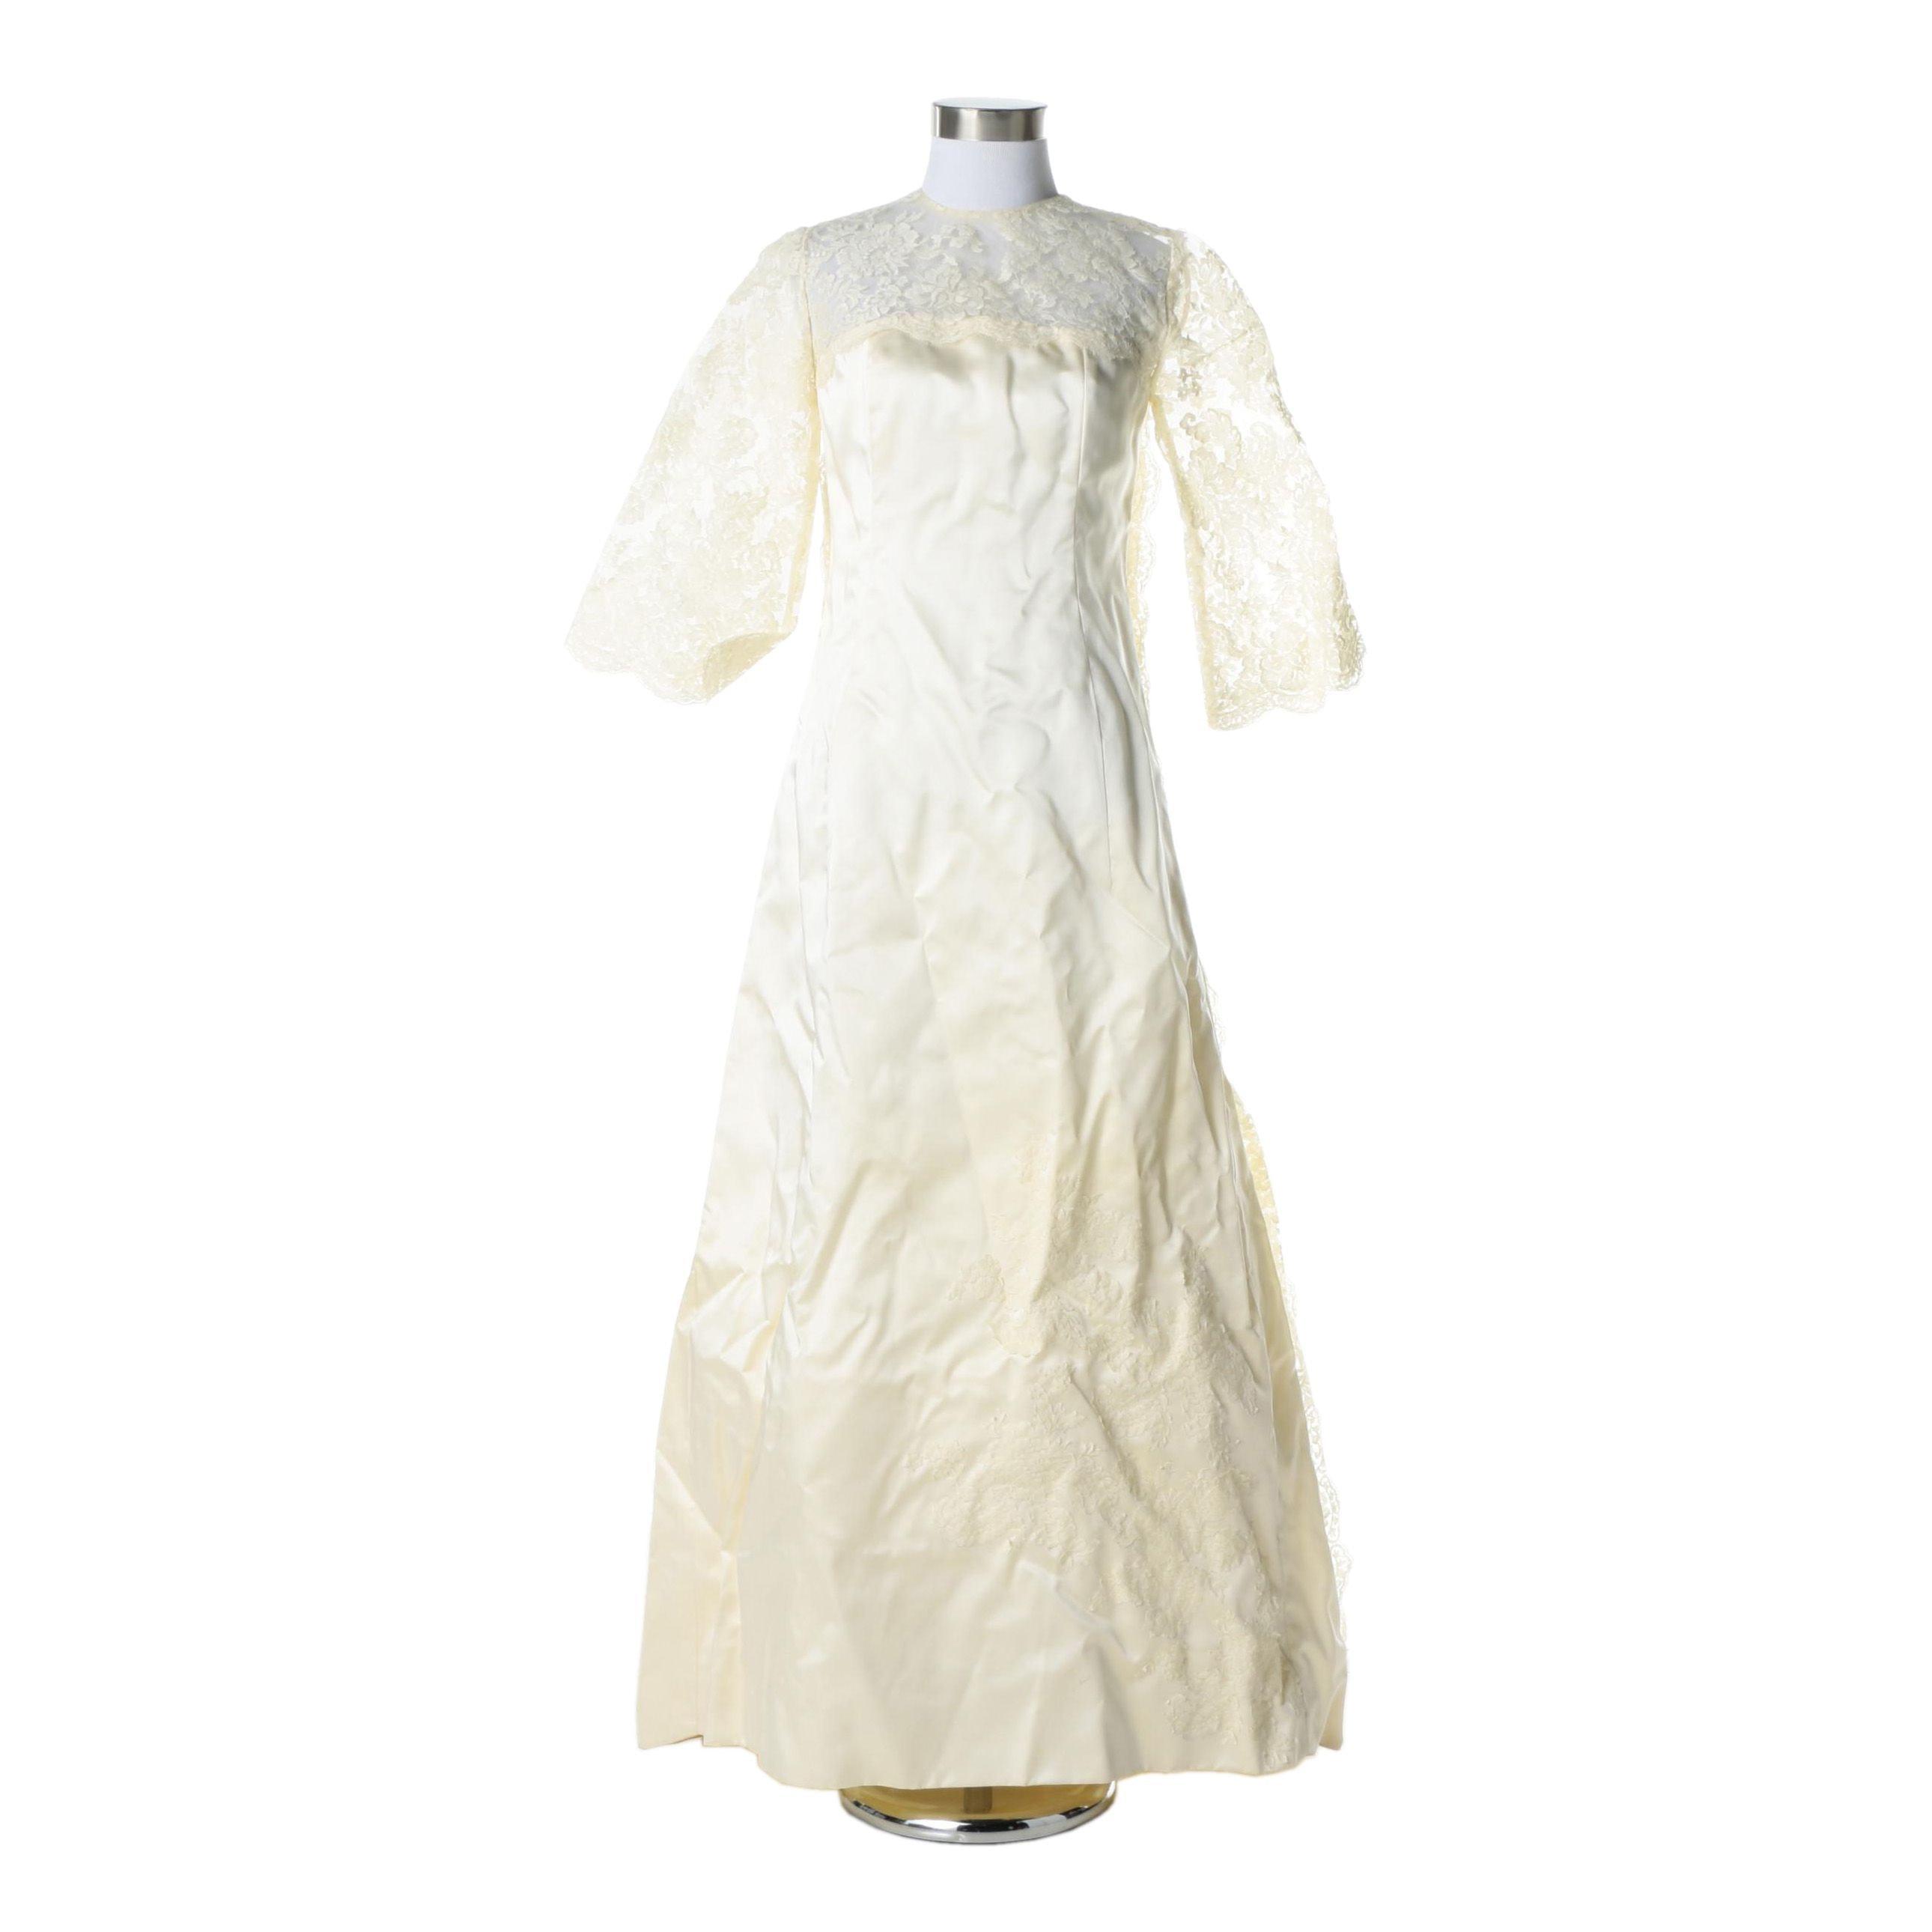 Circa 1950s Vintage Wedding Gown